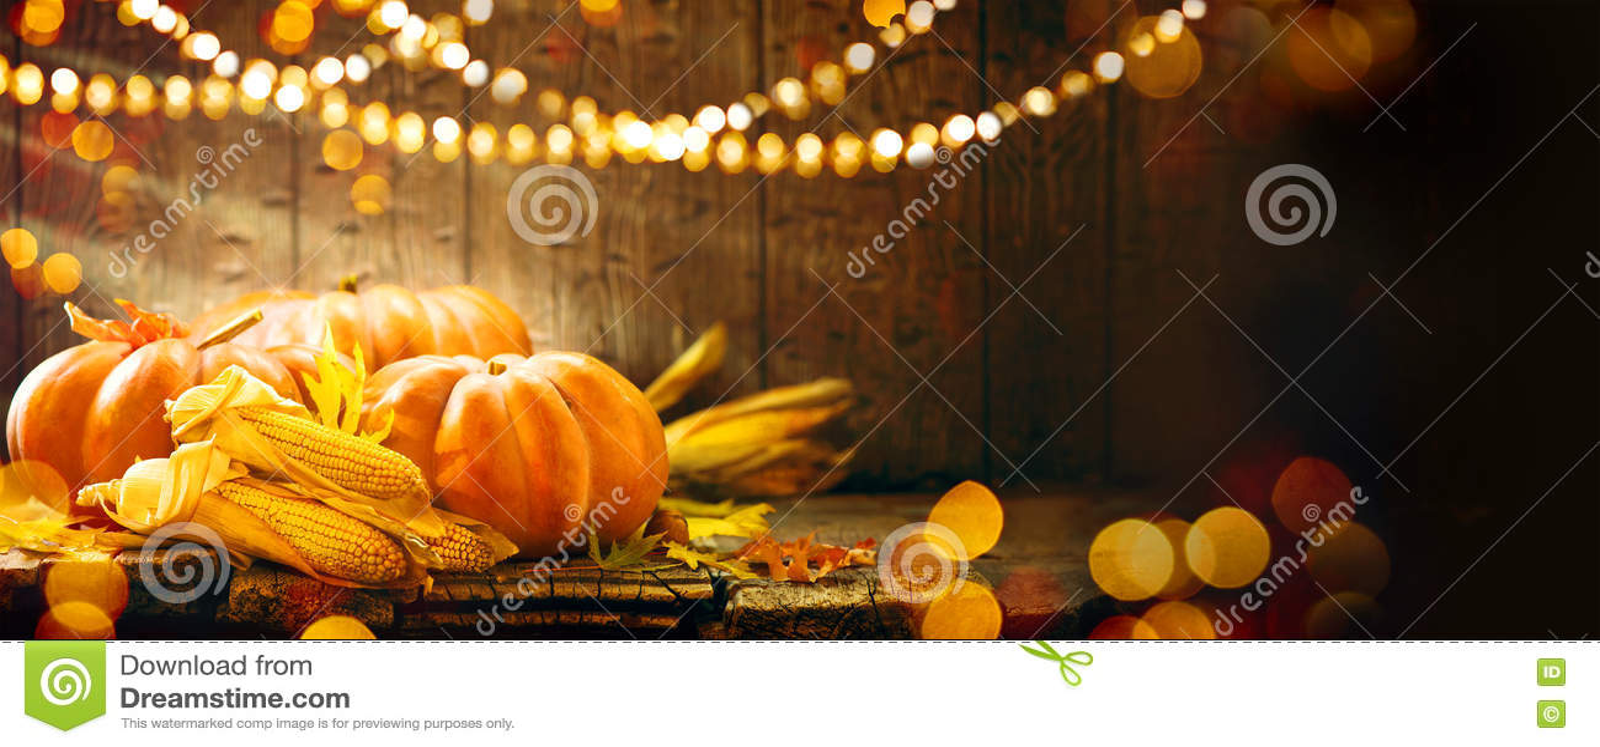 Abóboras de Autumn Thanksgiving sobre o fundo de madeira